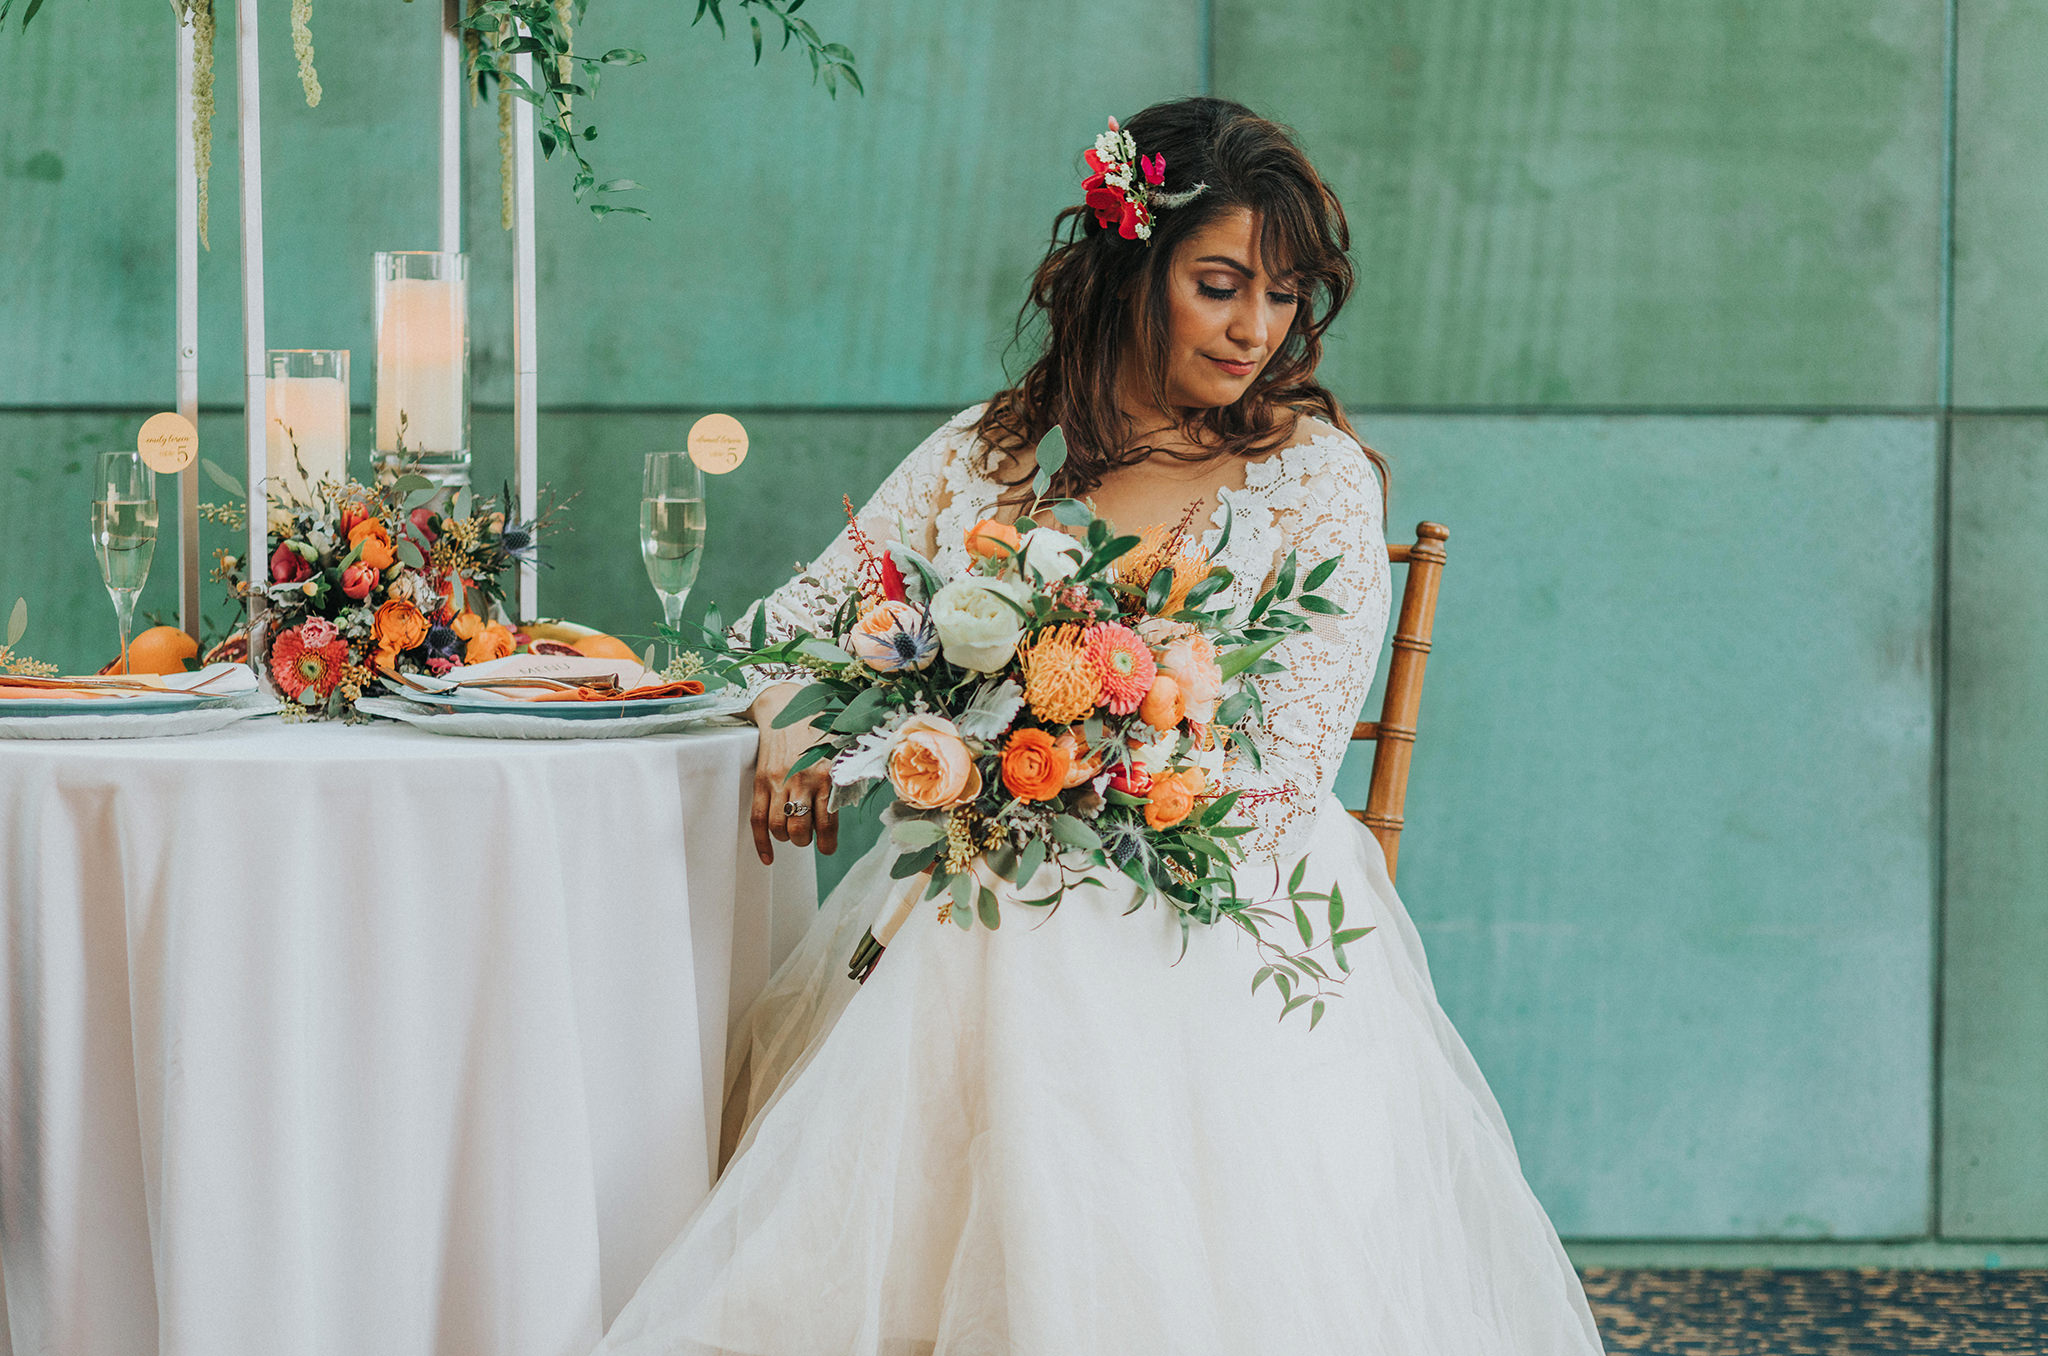 116 omaha-wedding-photographer-planner-tiny-luxe-velvet-sage.jpg